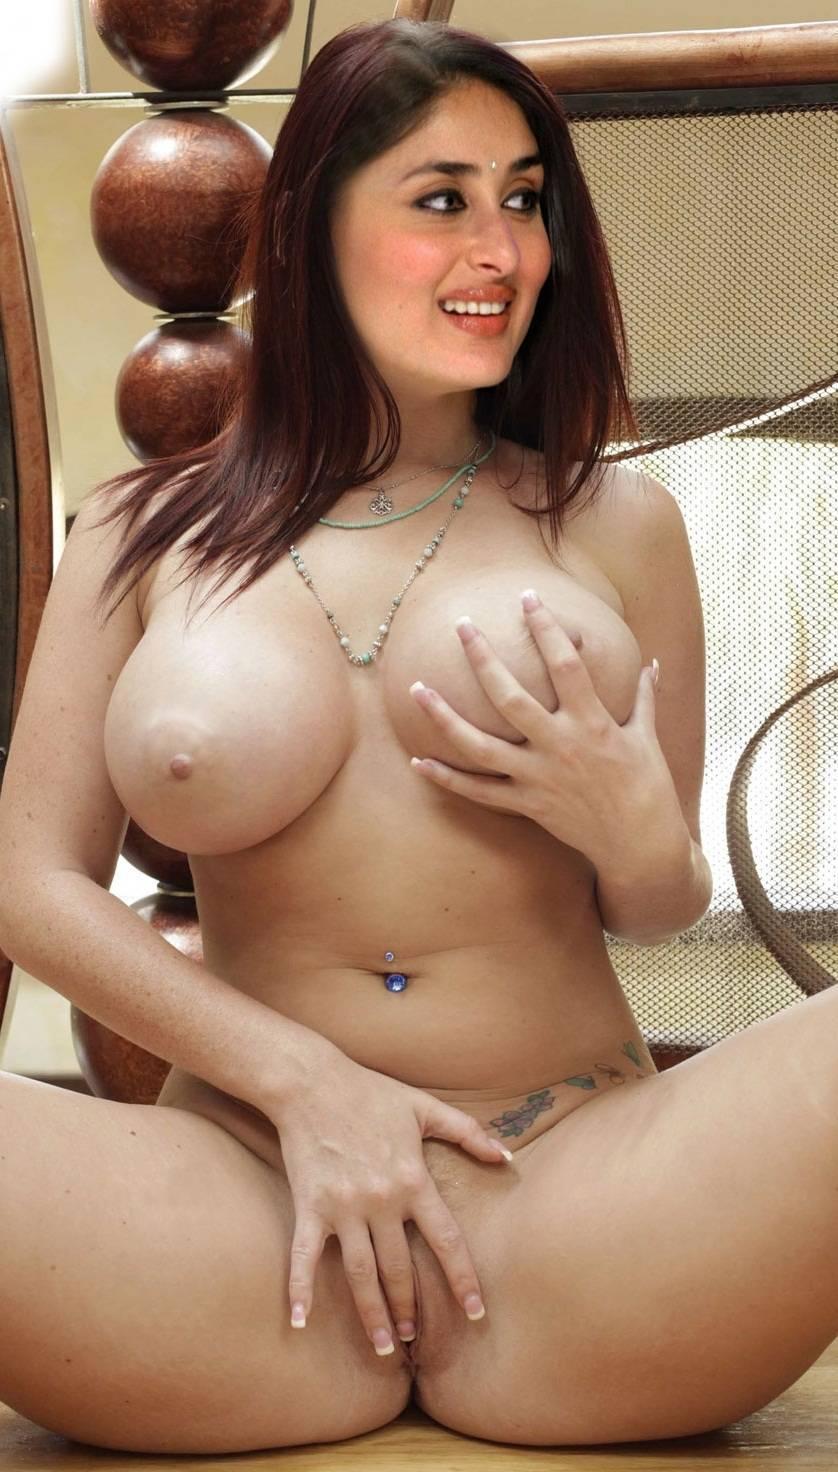 KareenaKapoorRubbingPussy - Kareena Kapoor Nude XXX Nangi Porn Pics